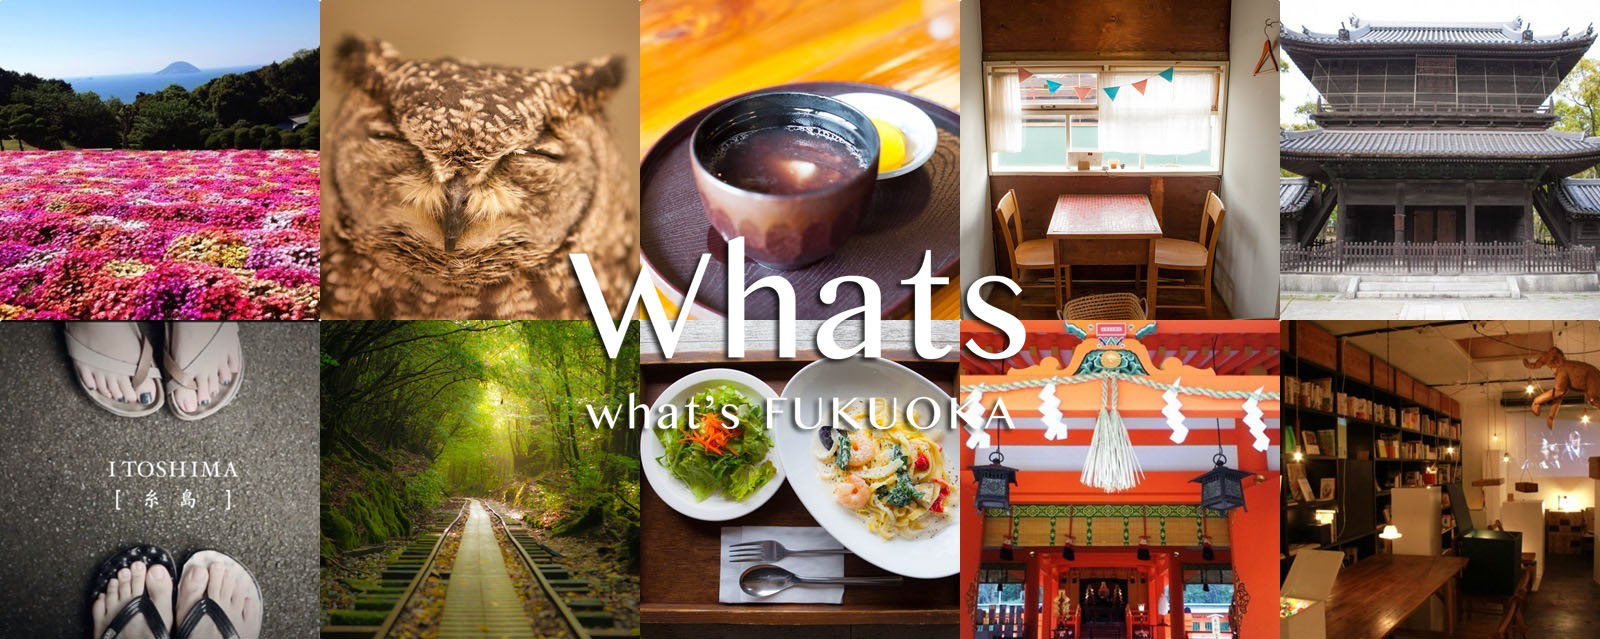 Whats Fukuoka -